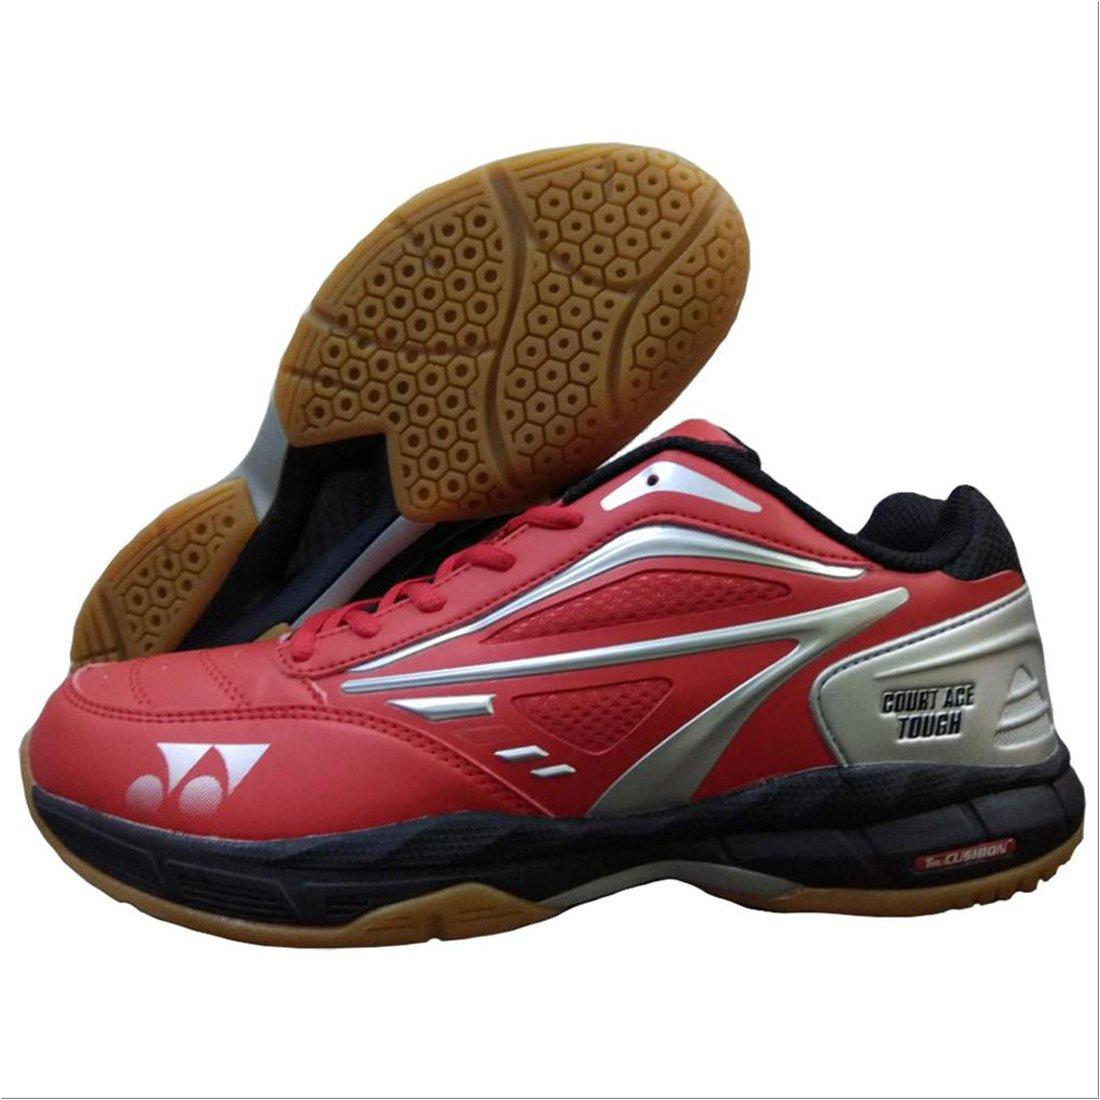 Yonex Federbälle, Ace (gumsloe-Badminton-Schuhe – Rot Schwarz Silber